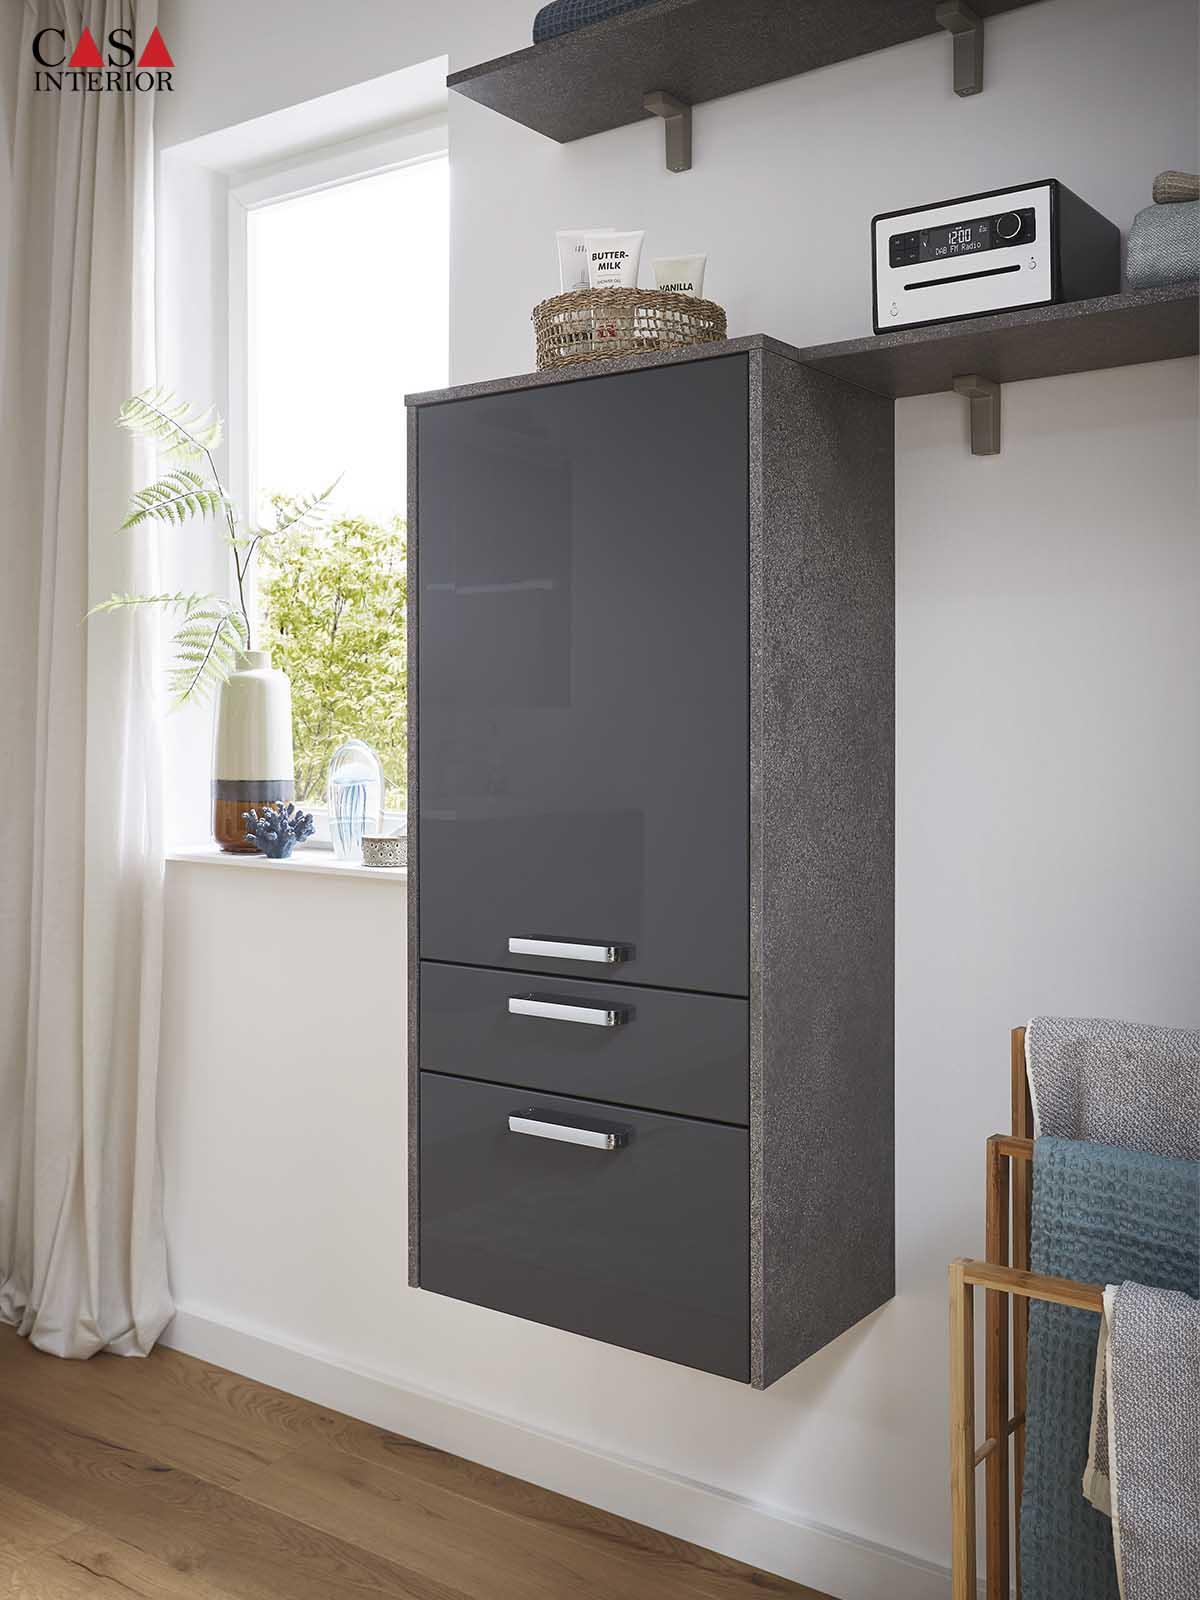 Küchentime Flash Lacquered laminate, slate grey high gloss 453 - Bathroom